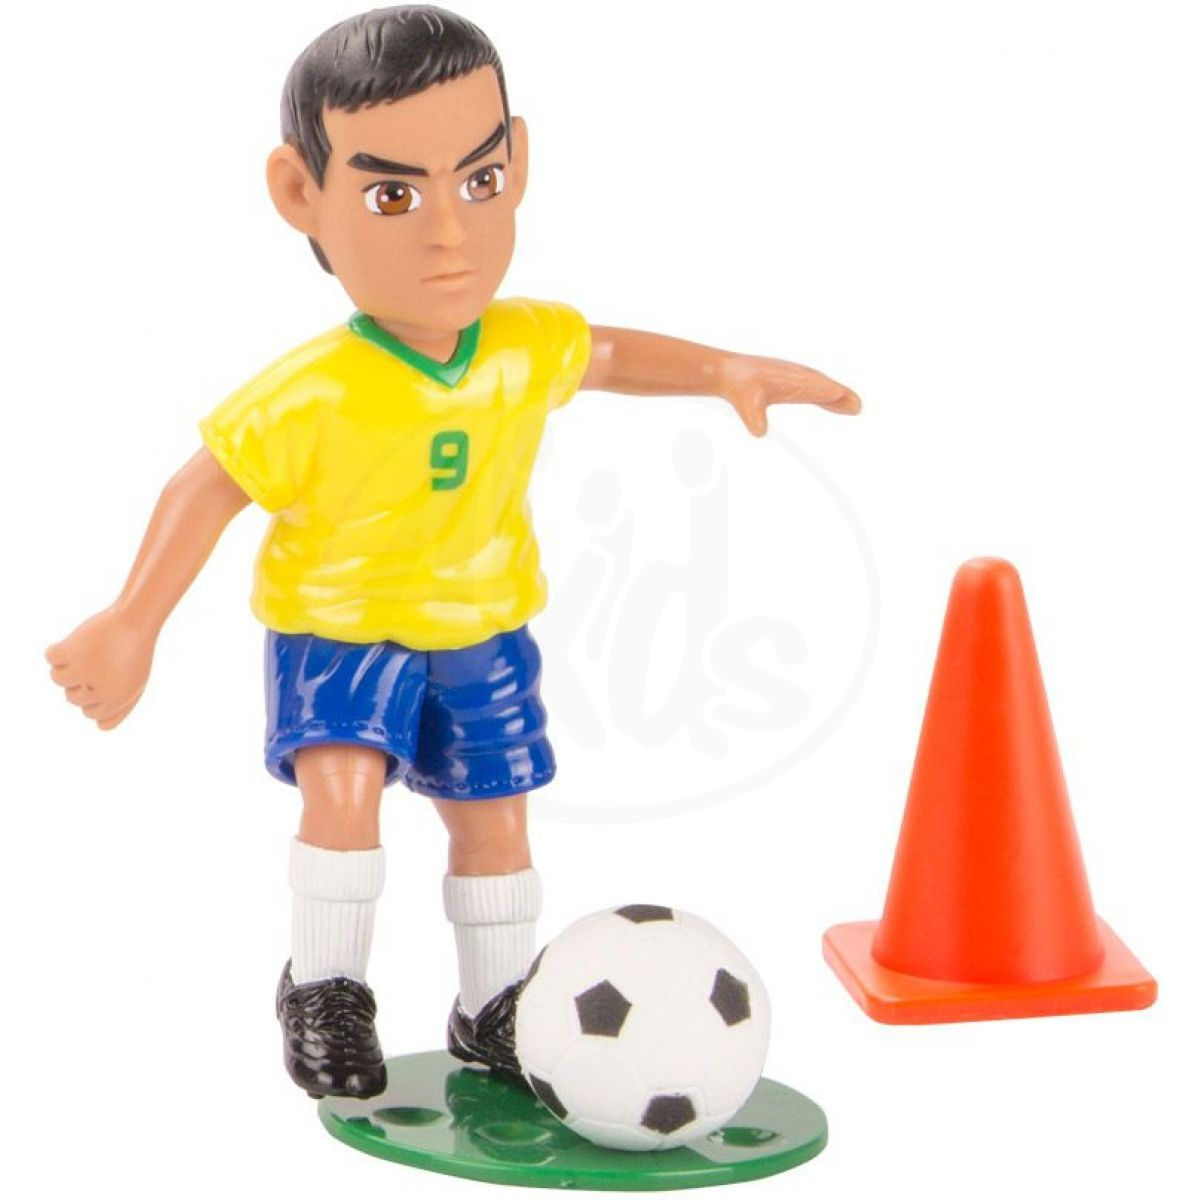 EP Line Shooters figurka Brazílie č. 9